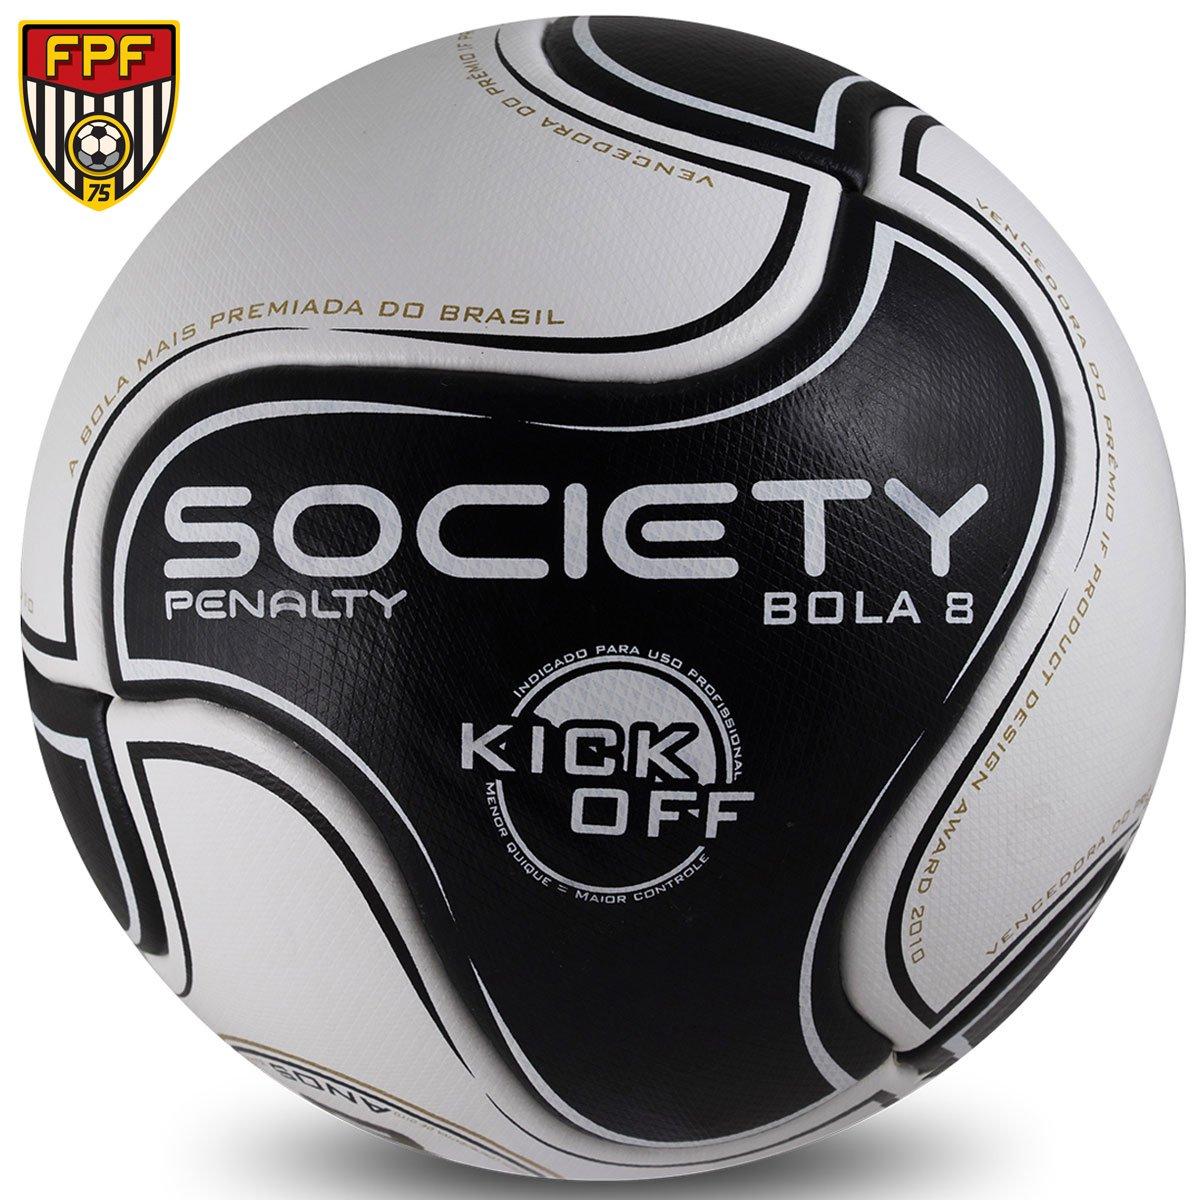 24cfa4080a ... Bola Futebol Society Penalty 8 S11 R1 Kick Off 6 - Compre Agora .. ...